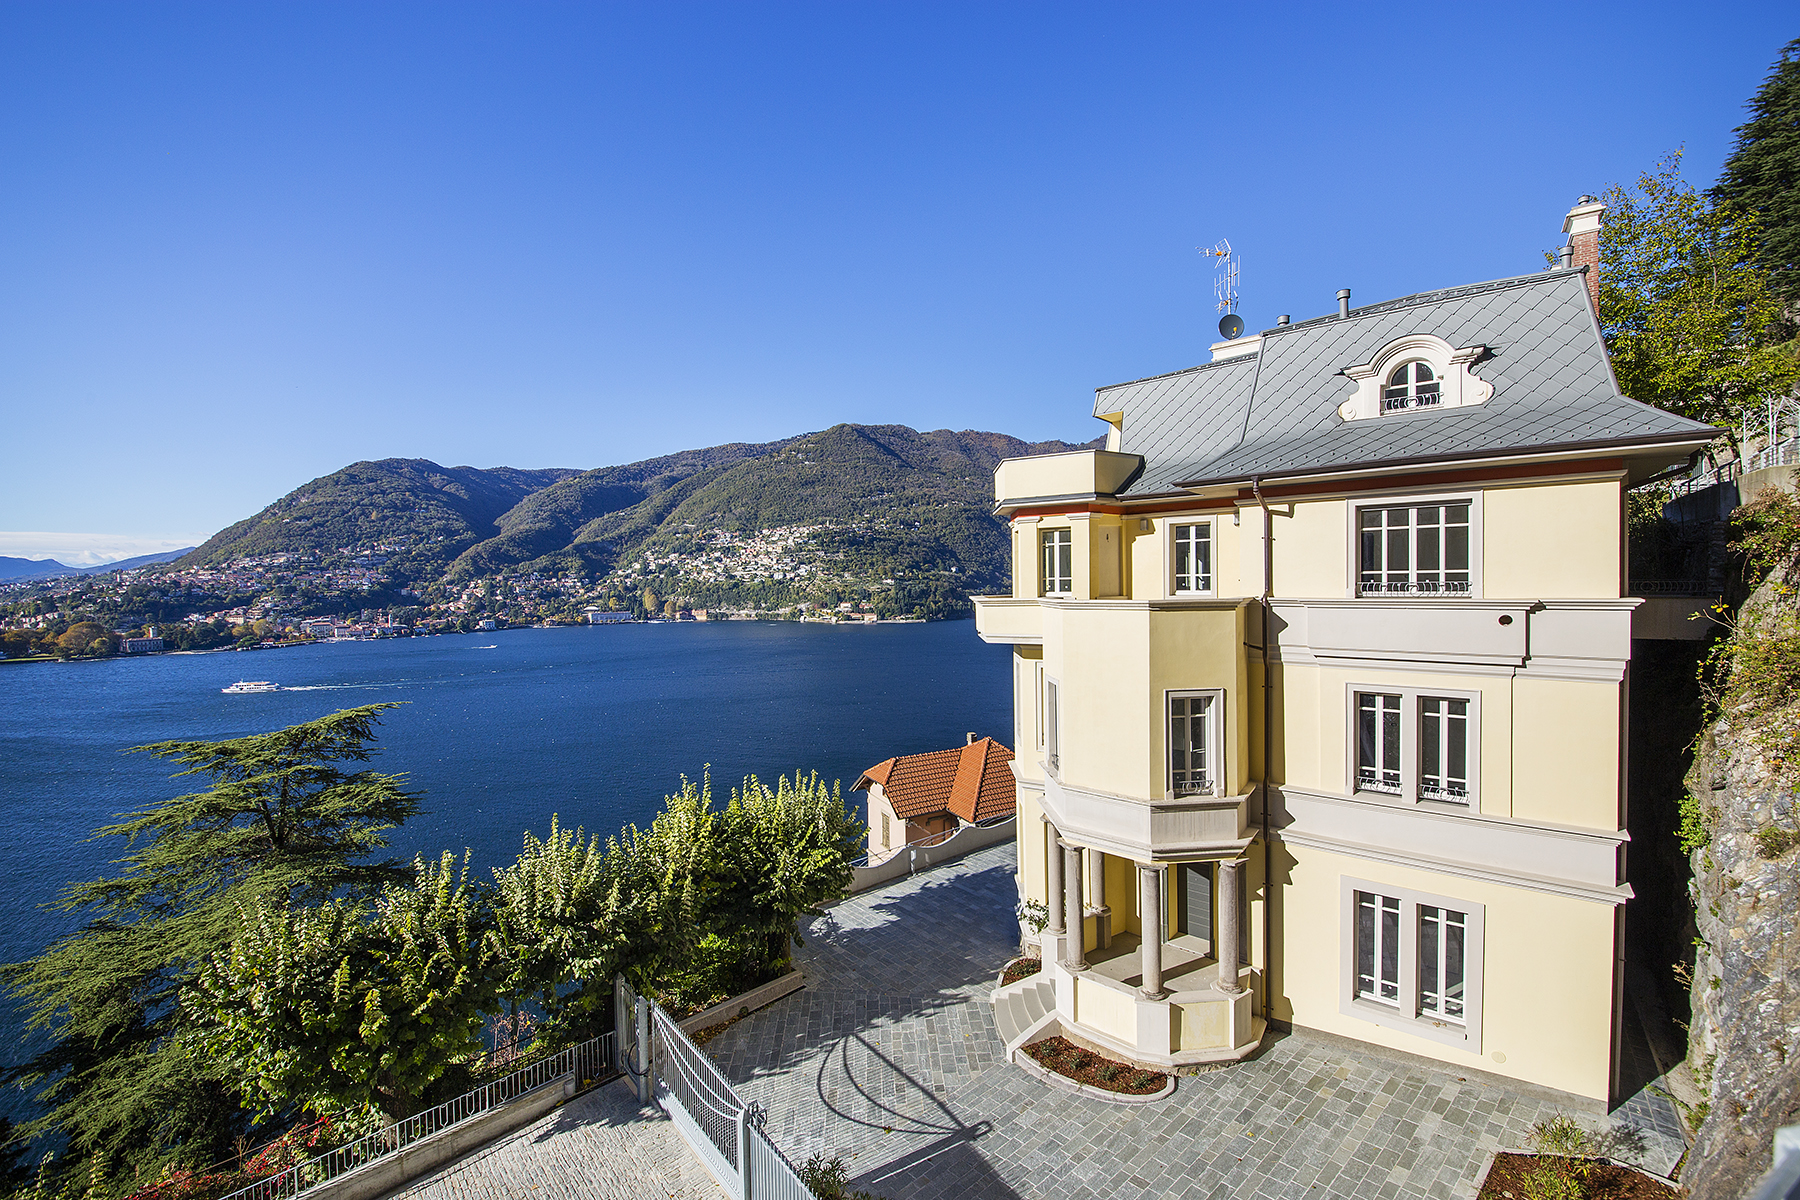 شقة للـ Sale في Stunning apartment in historical villa of the late 19th century Blevio, Como, Italy